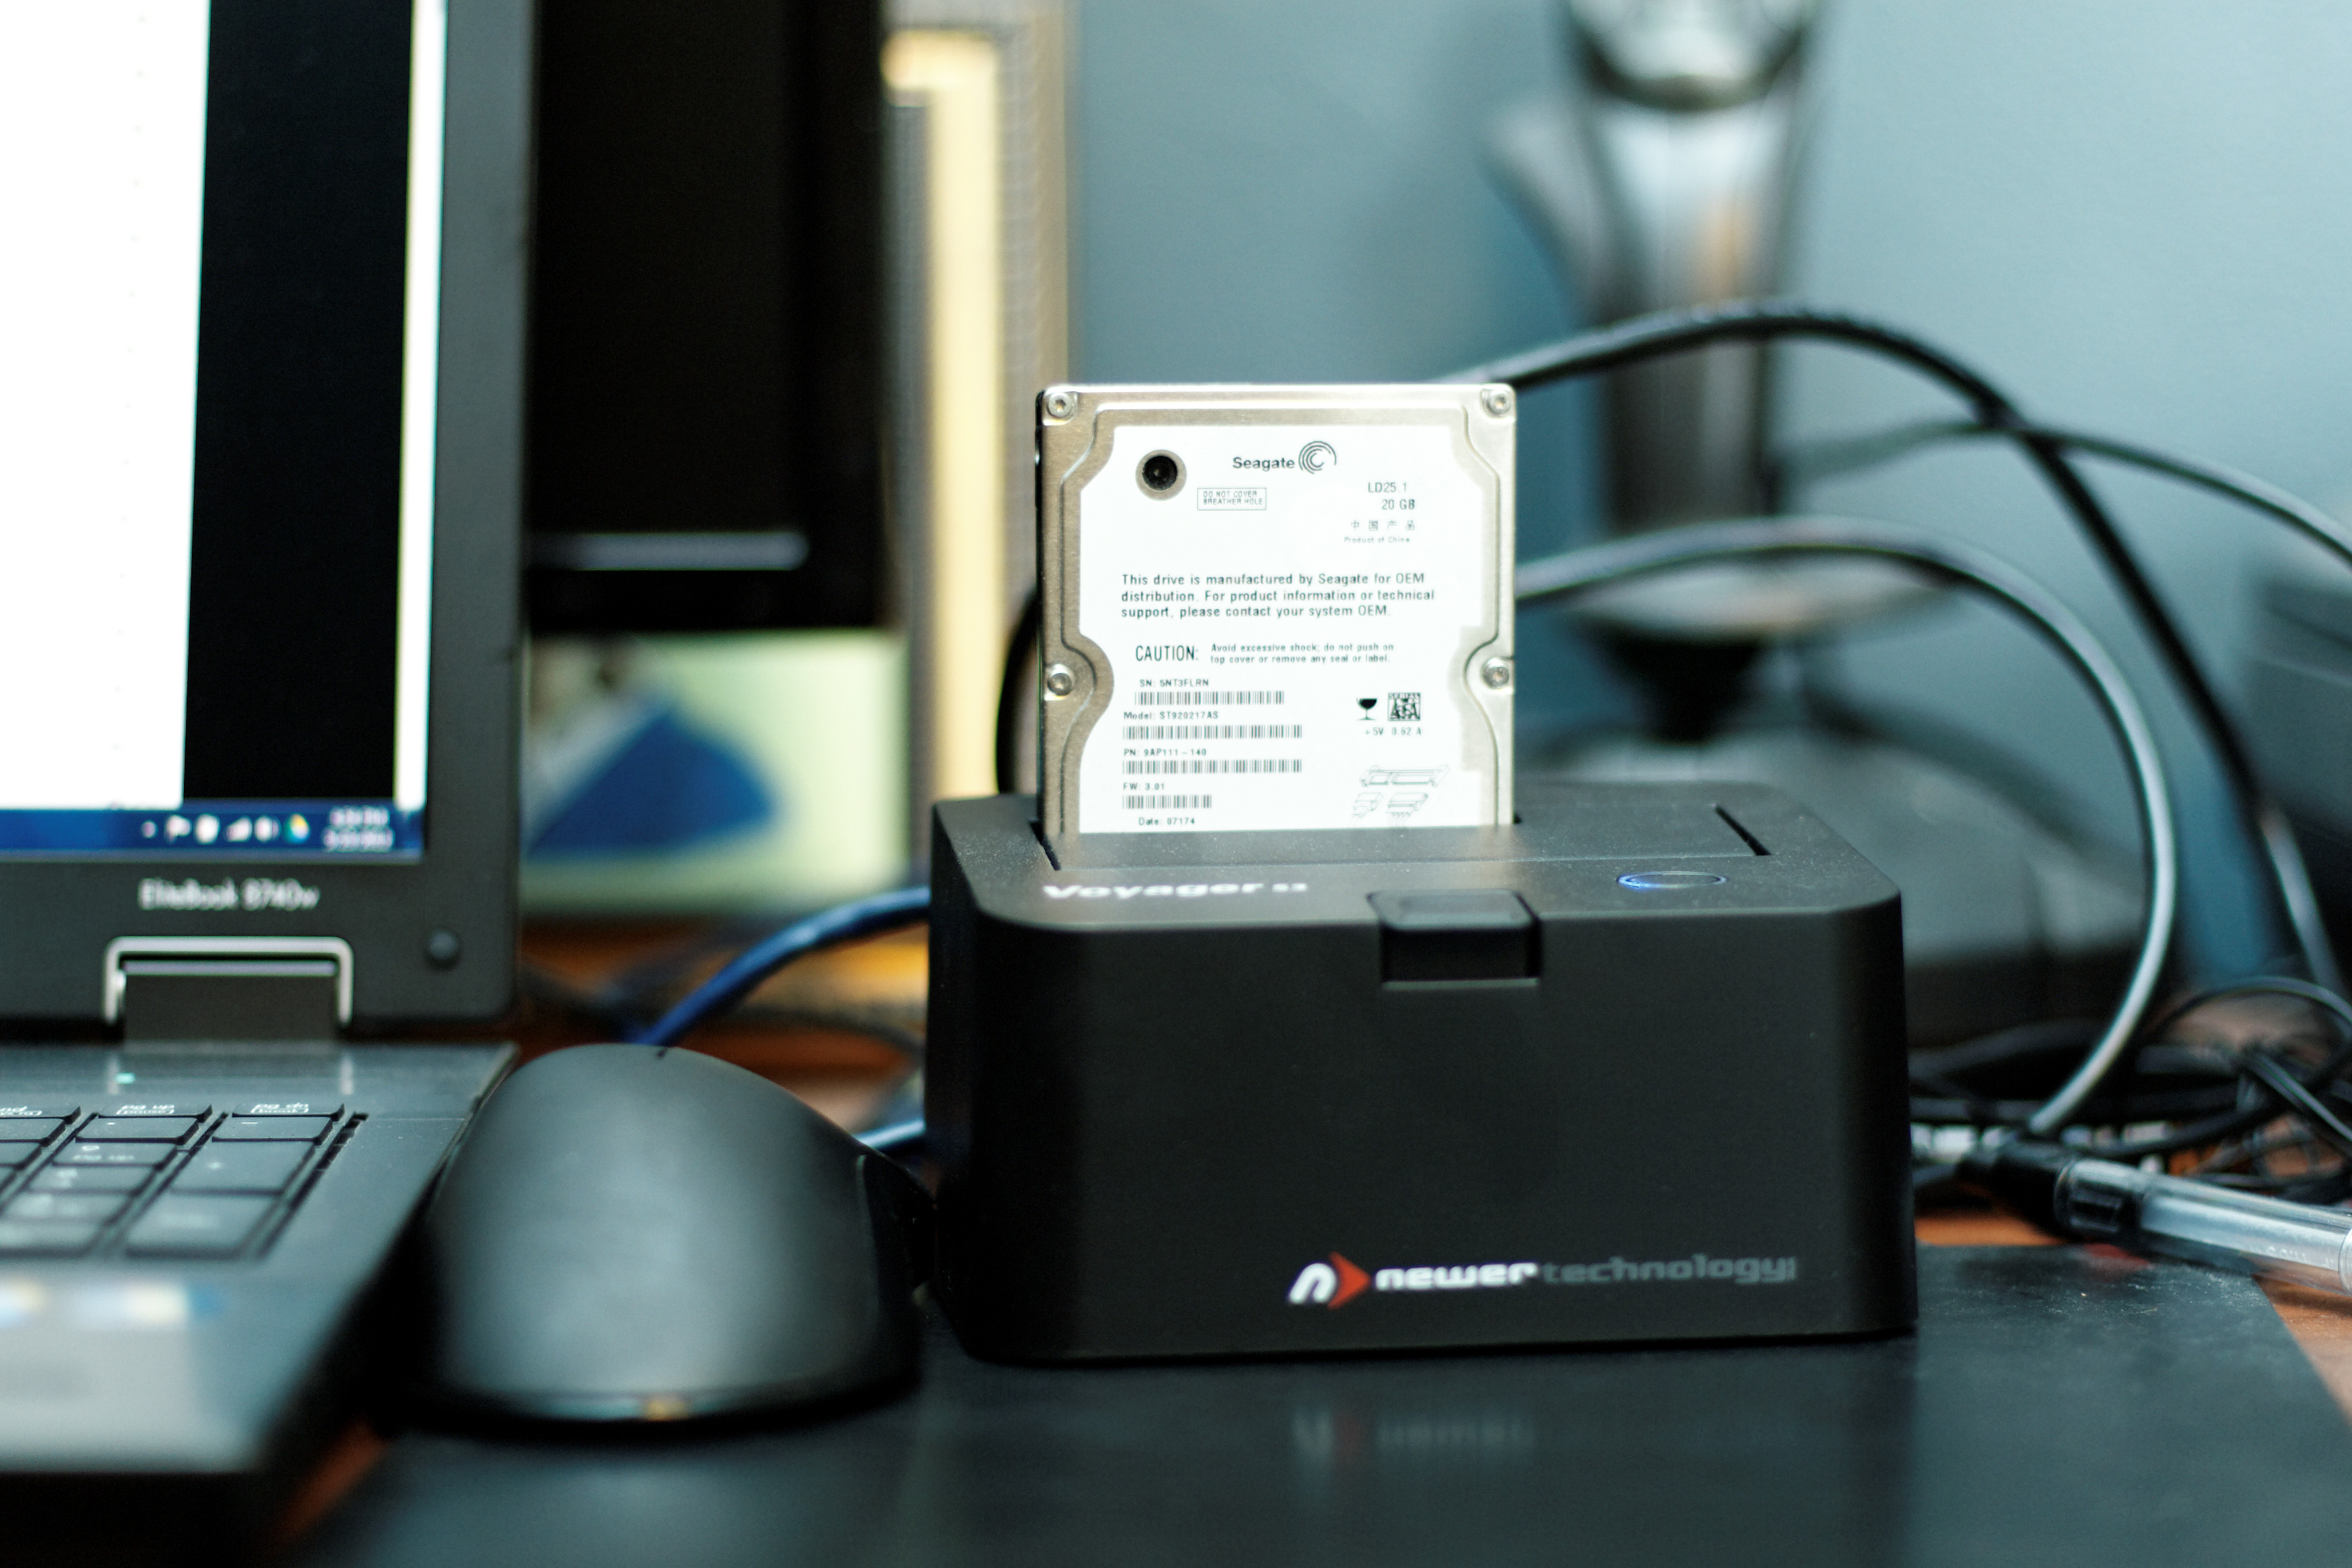 drive portable n ci toaster state c hard mu solid ssd photo samsung blue b buy h external drives am